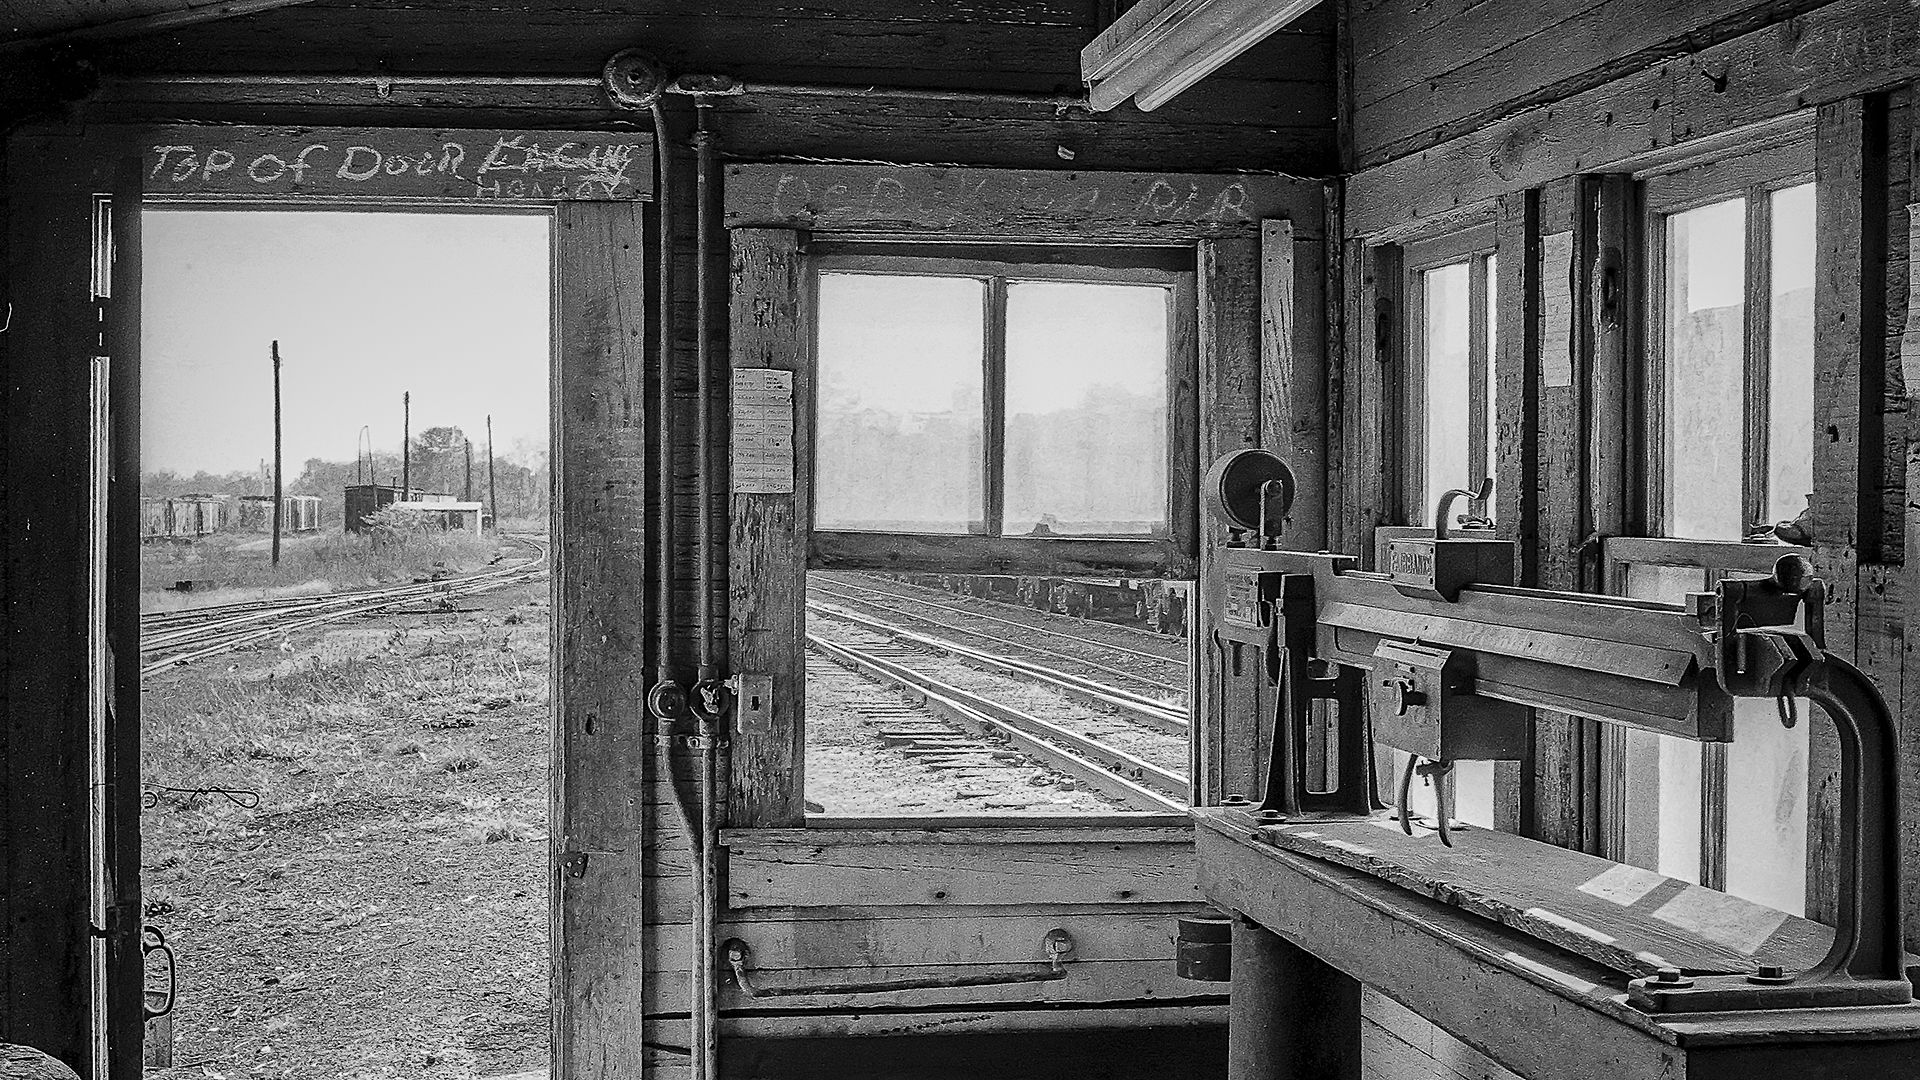 McDoel Yard-004-Jim Maire-1973-Edit.jpg